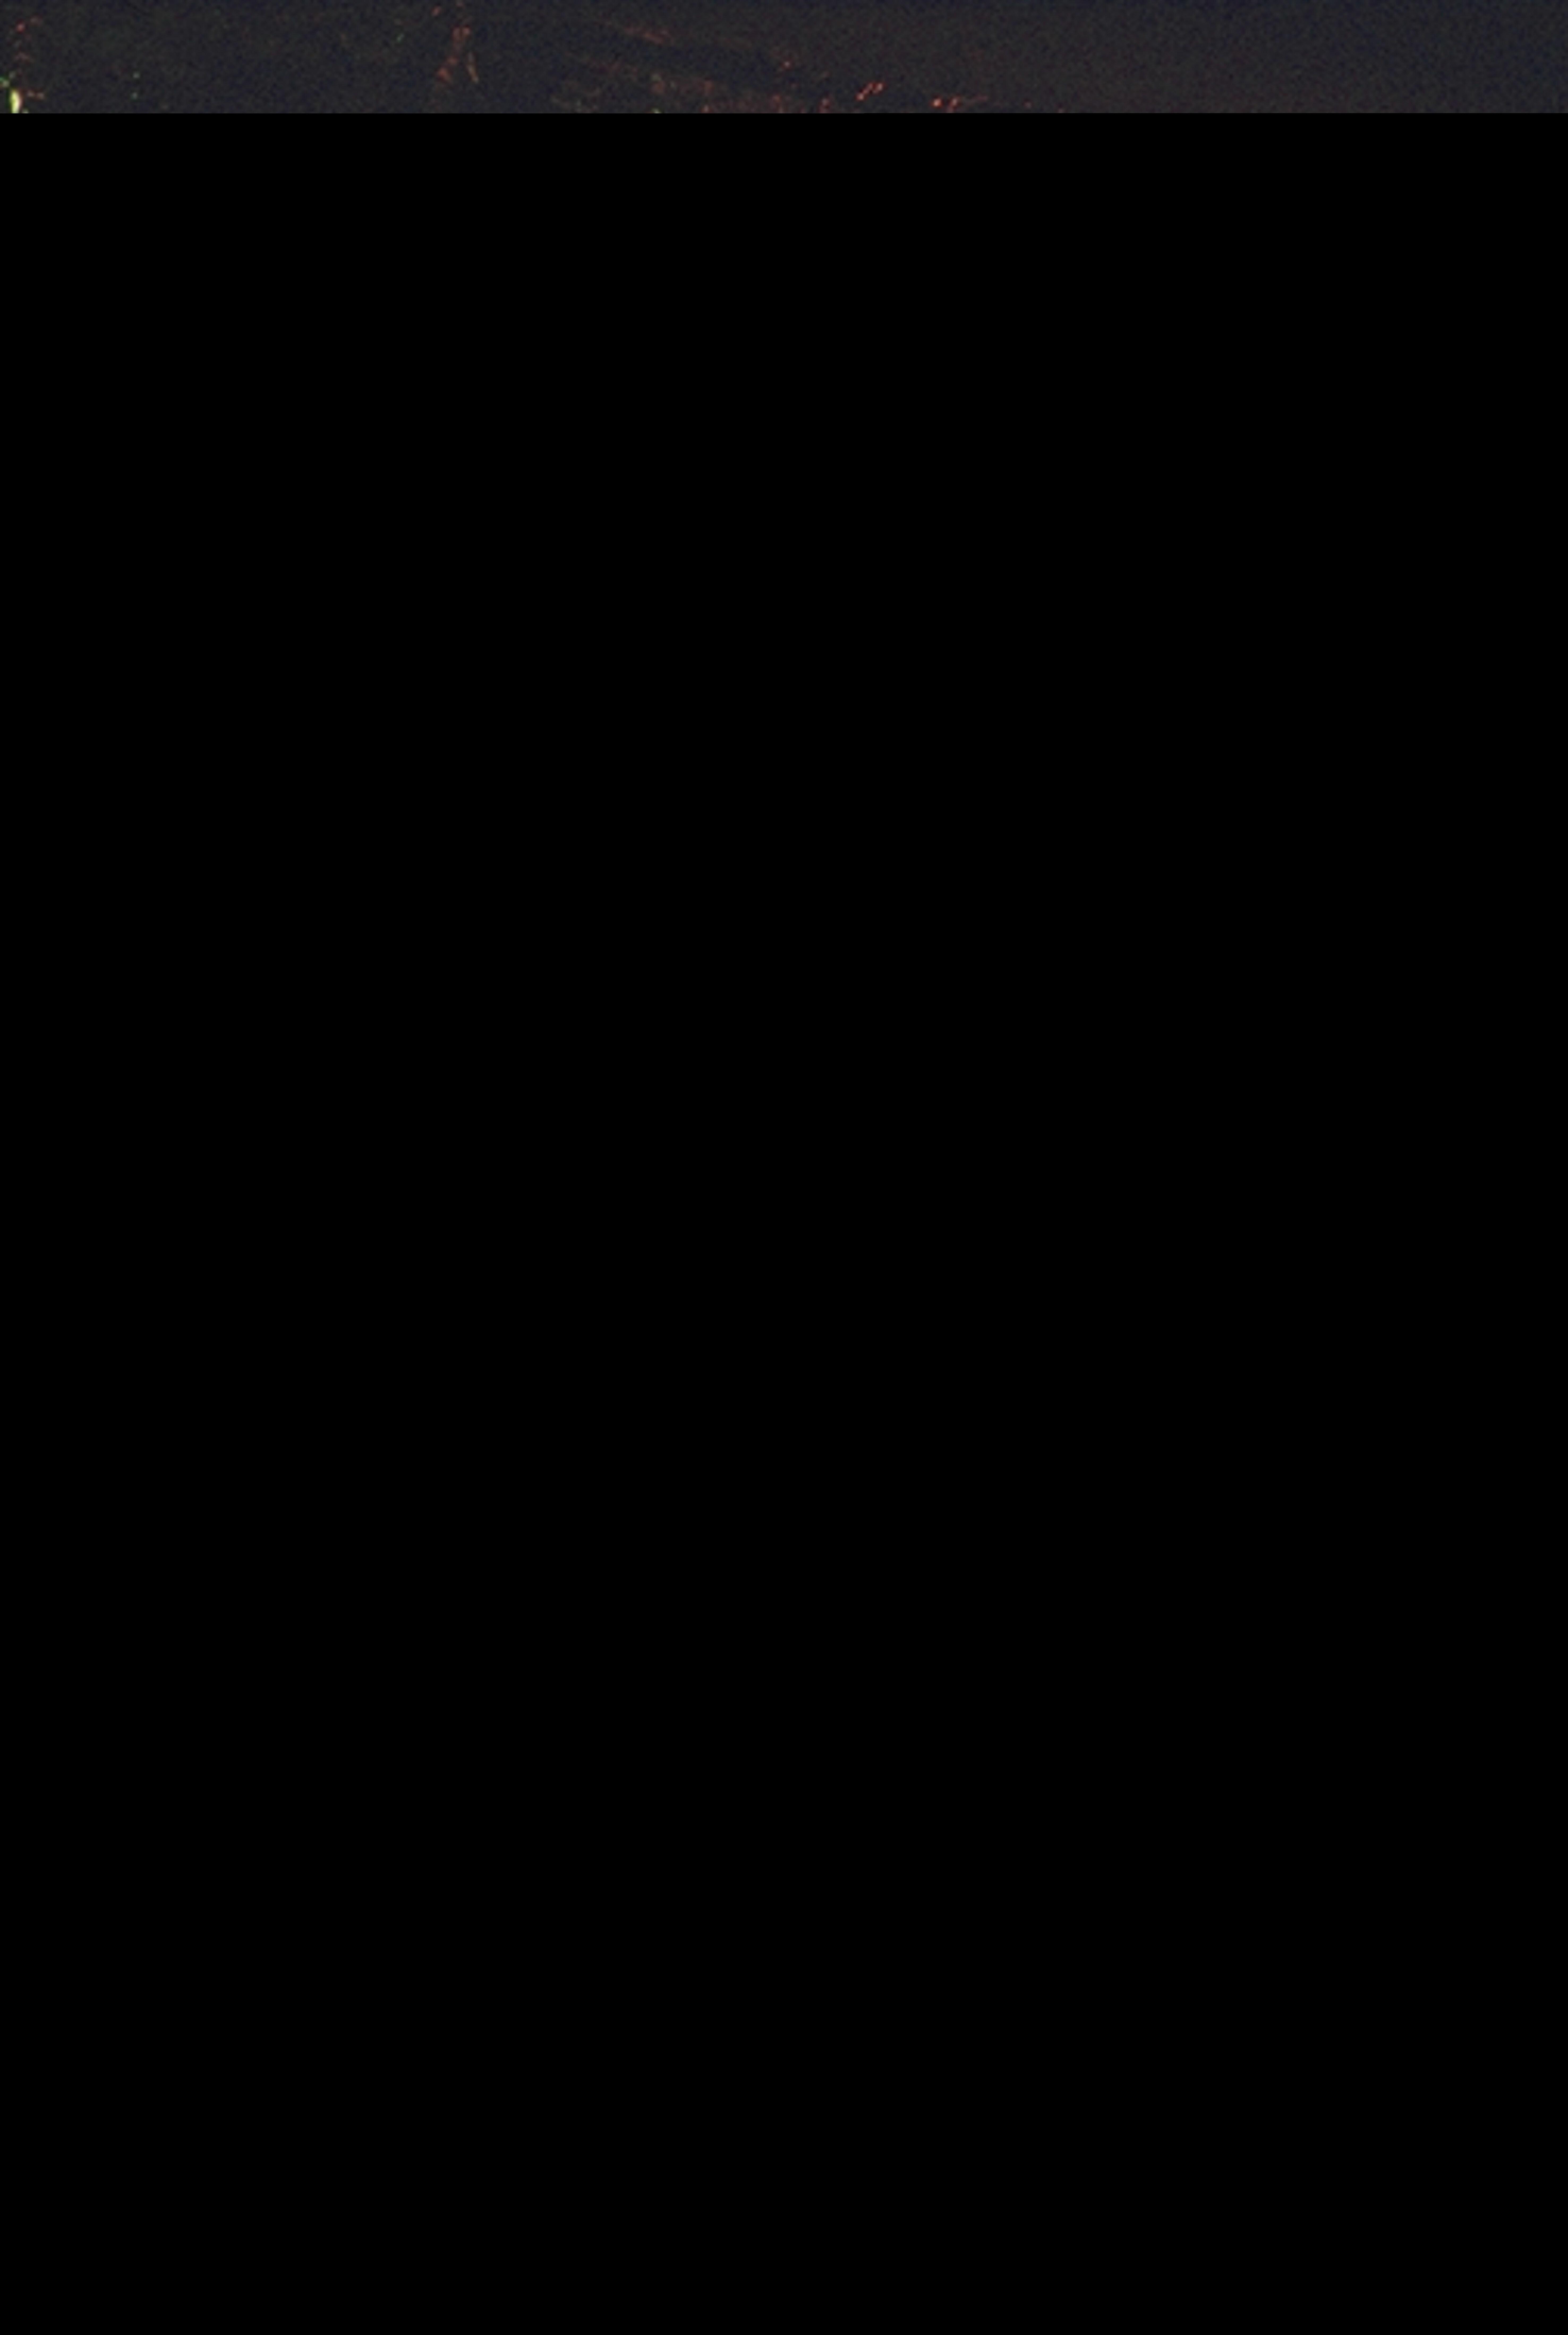 IMG0019